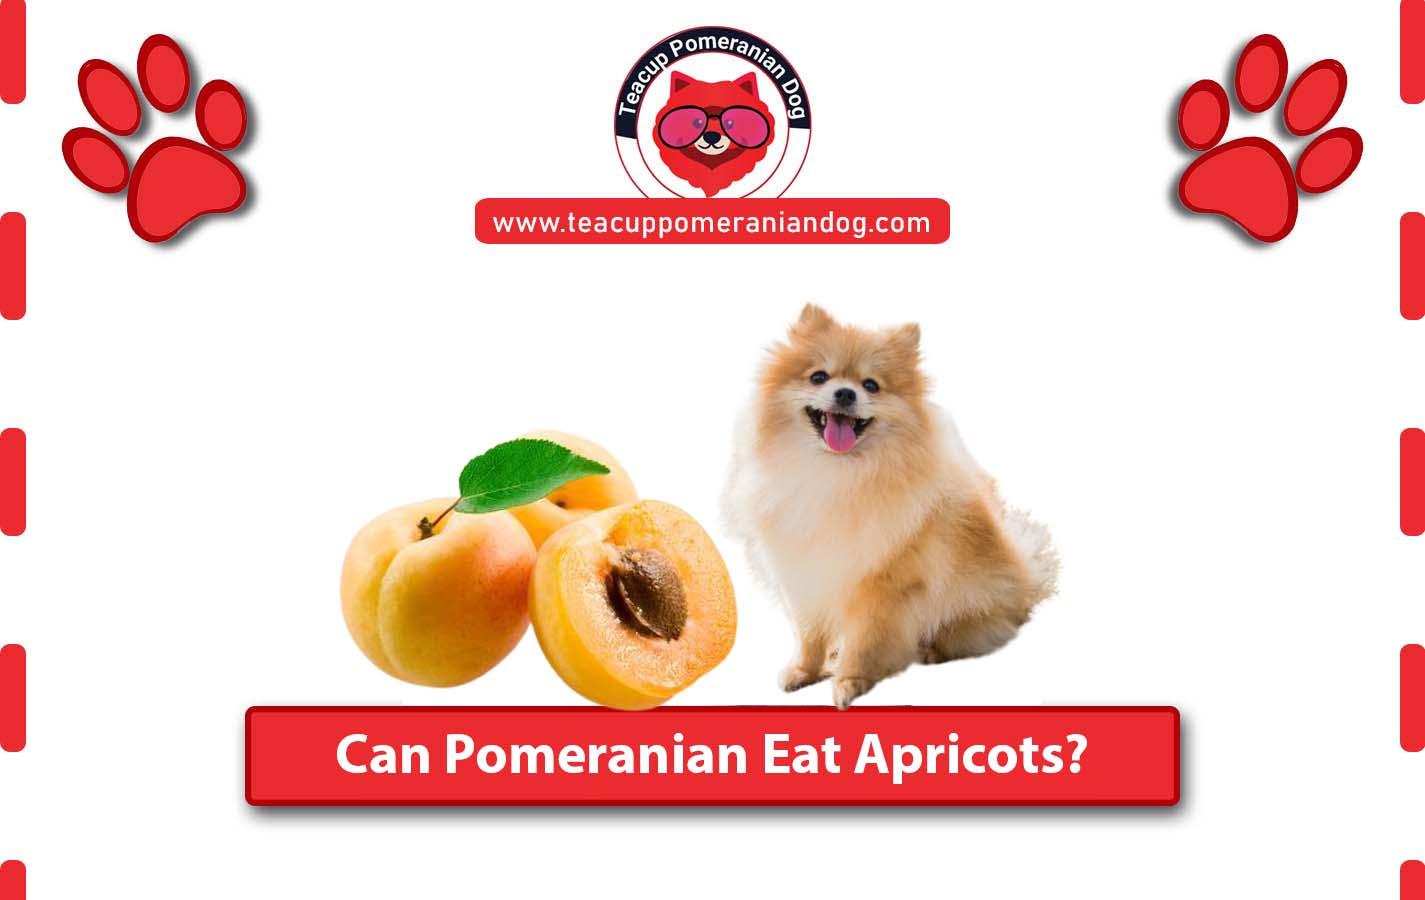 Can Pomeranian eat apricots2